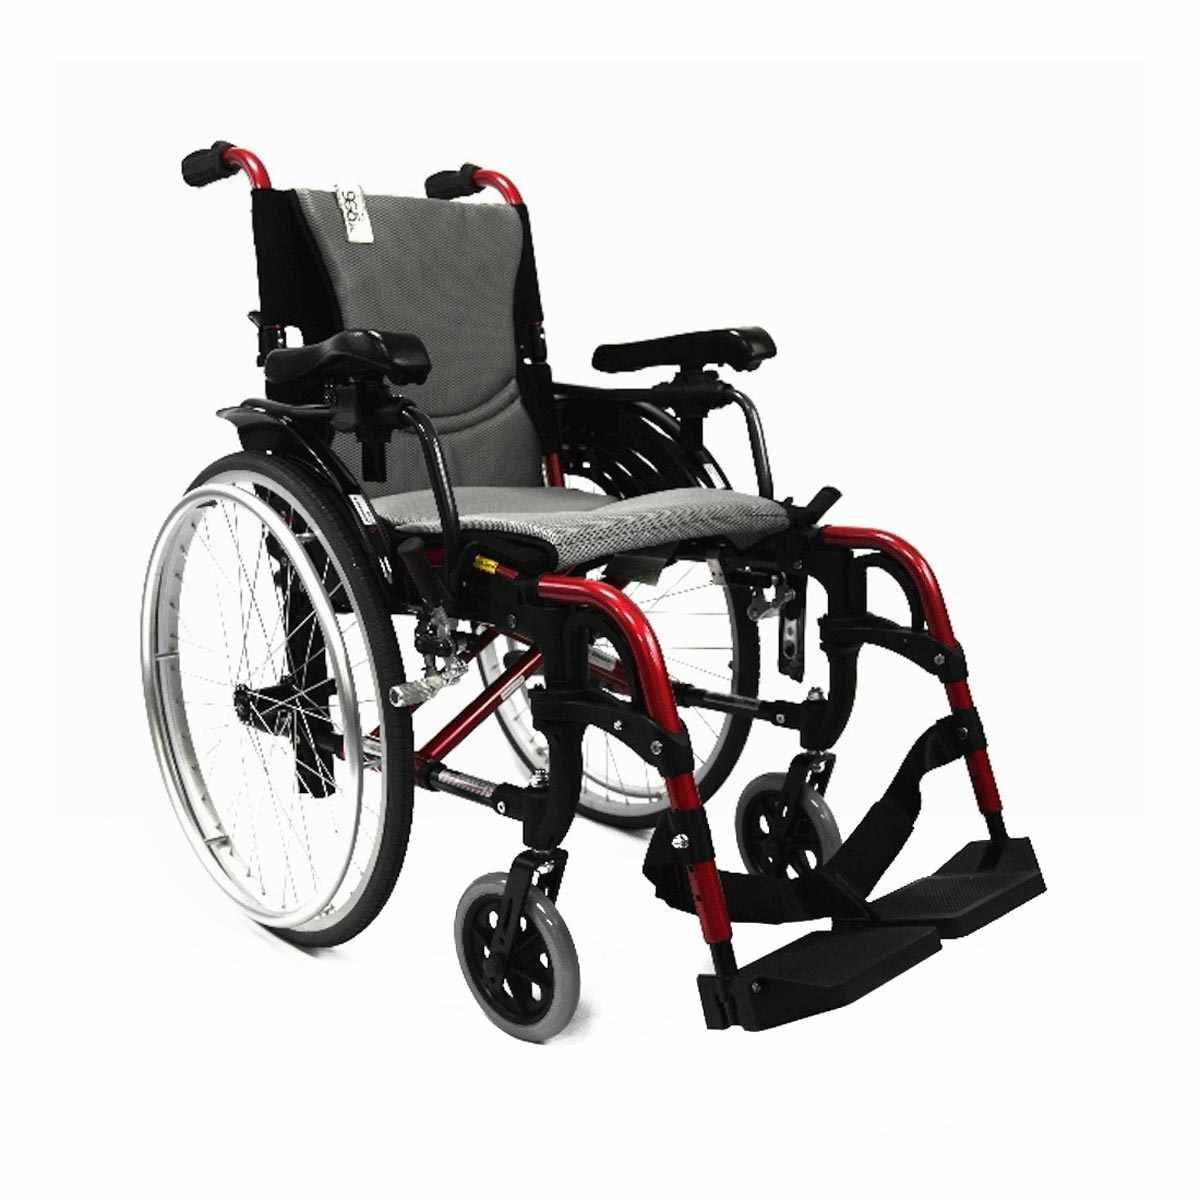 Karman healthcare S-ERGO 305 adjustable ergonomic wheelchair